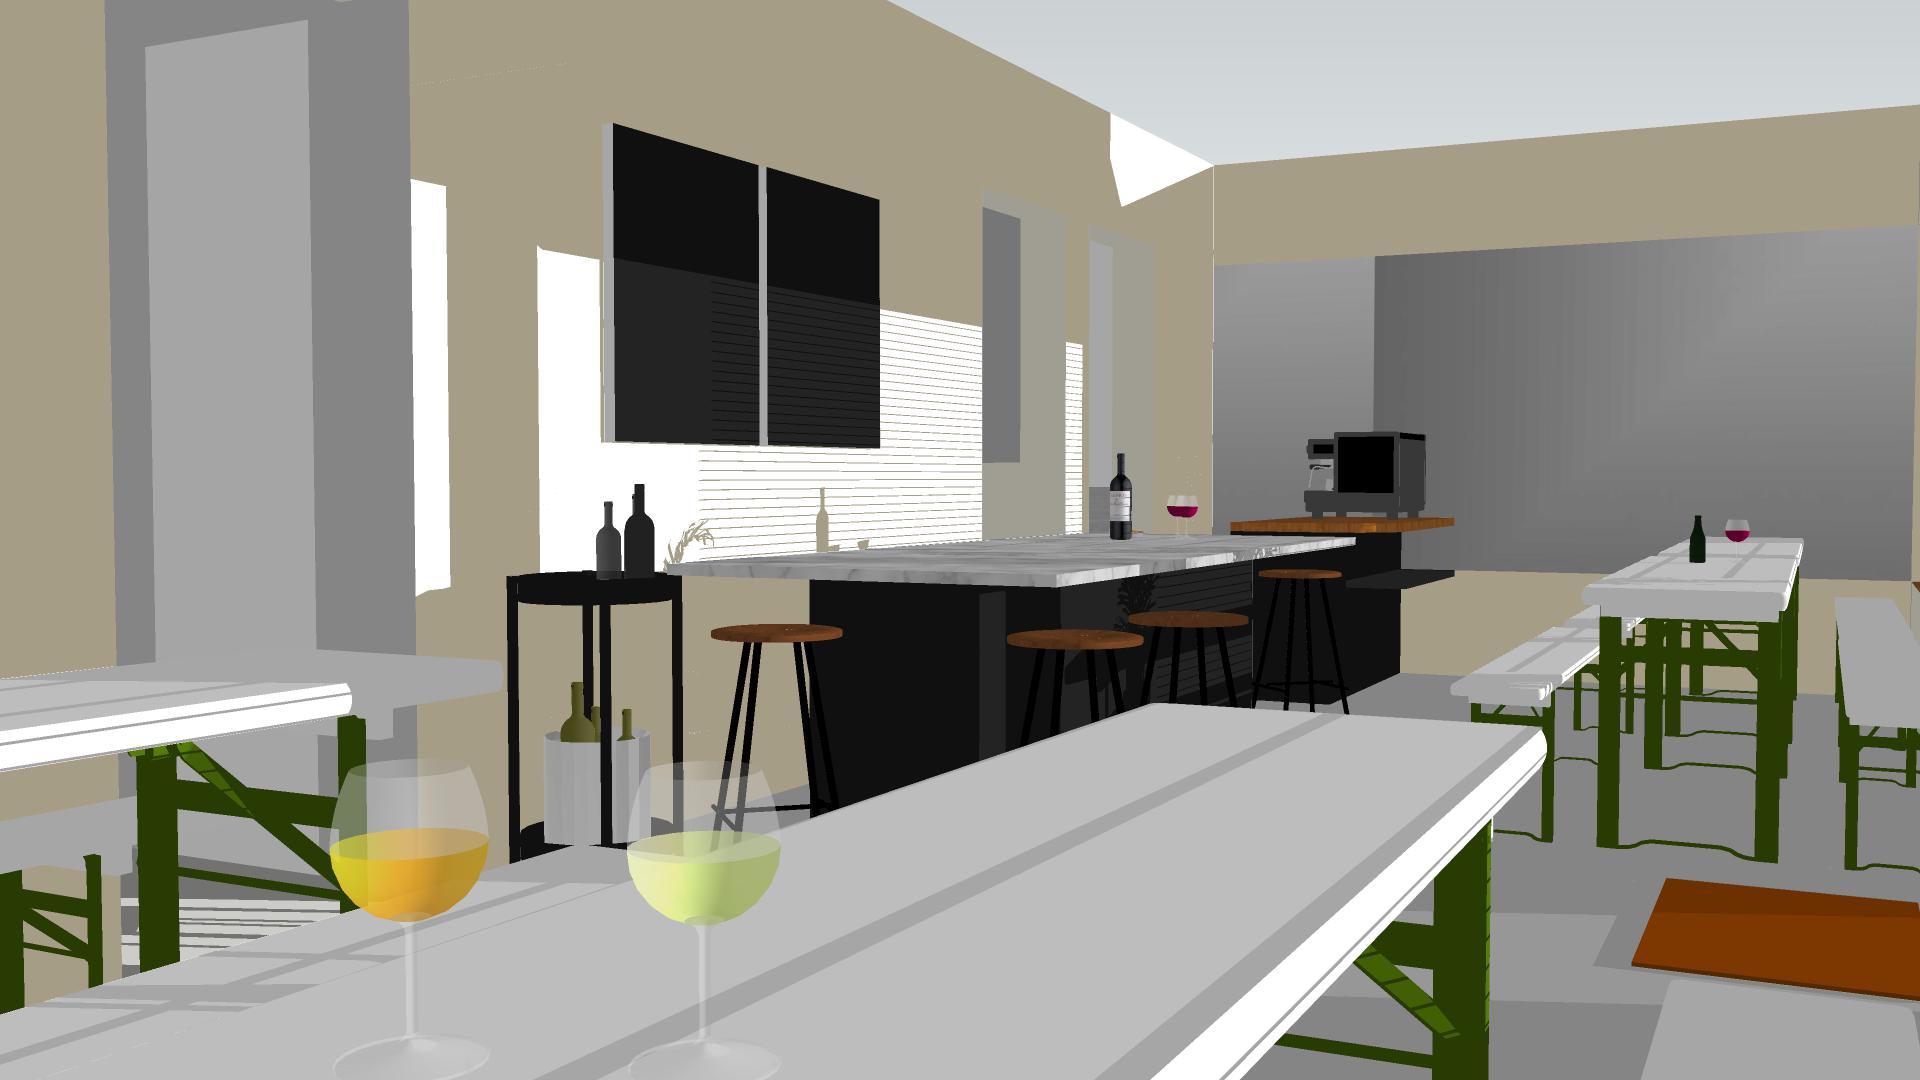 Peryton-Sketchup 6-wine bar0014.jpg